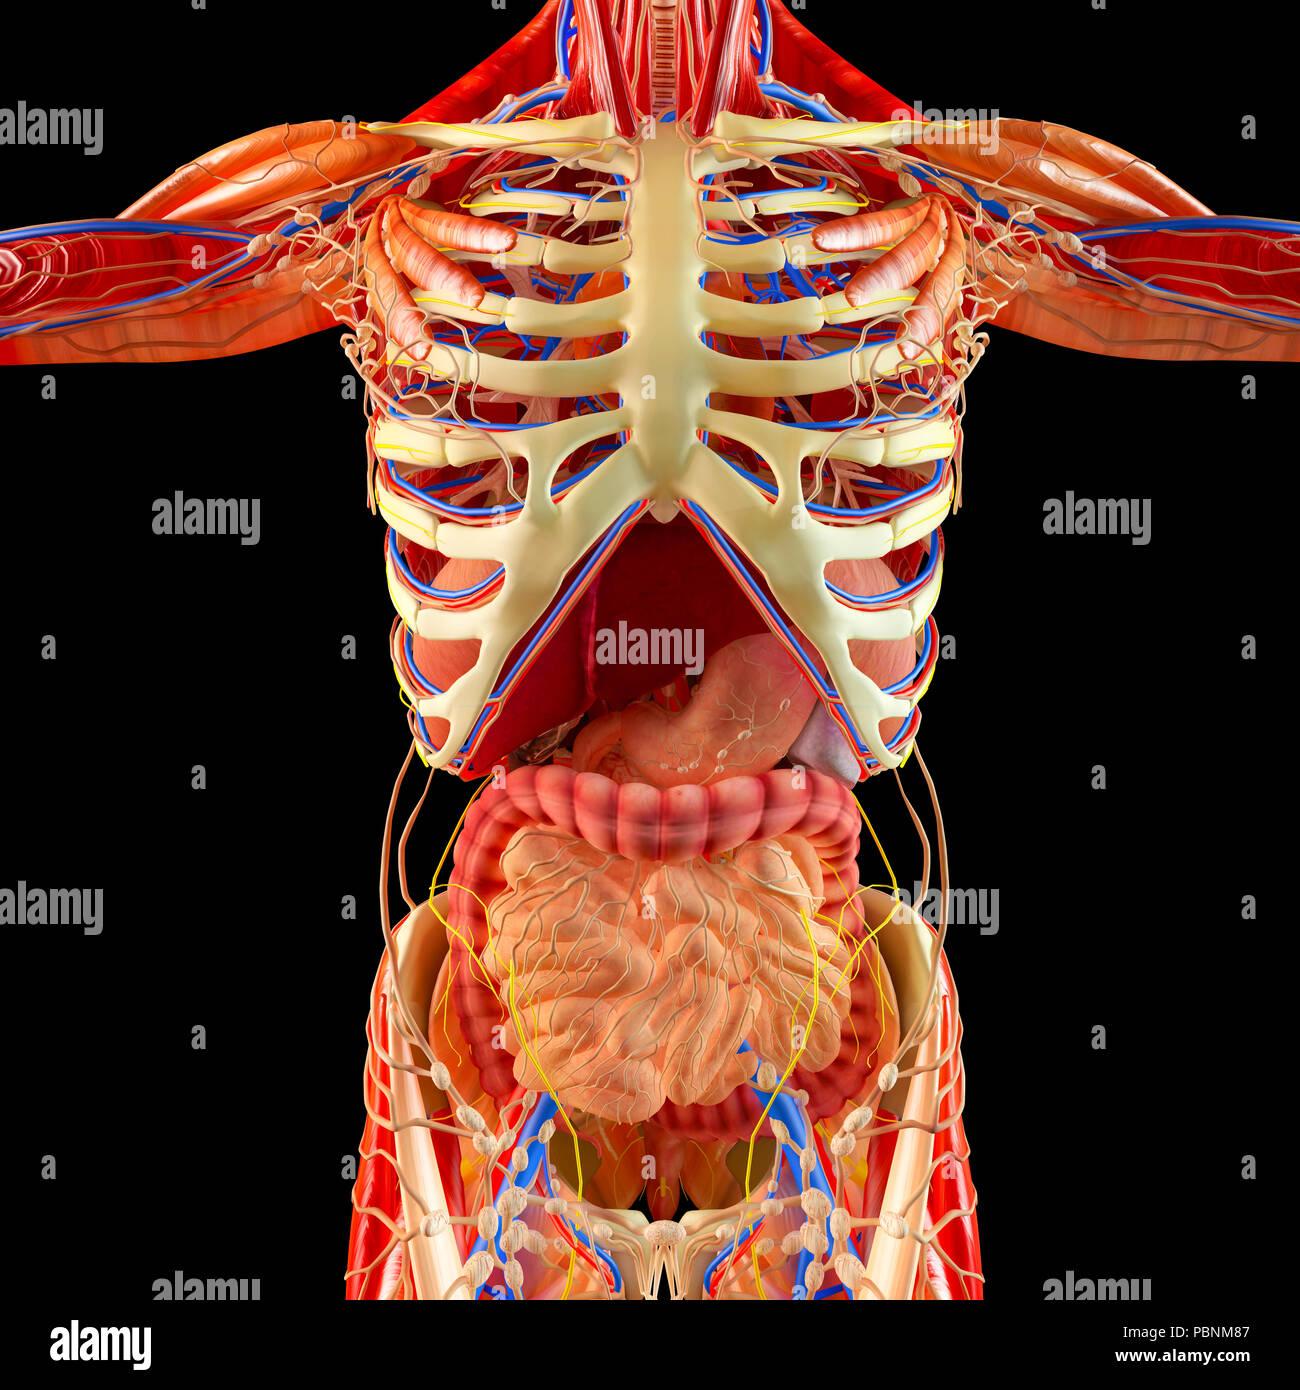 Human Body Muscular System Internal Organs Digestive System